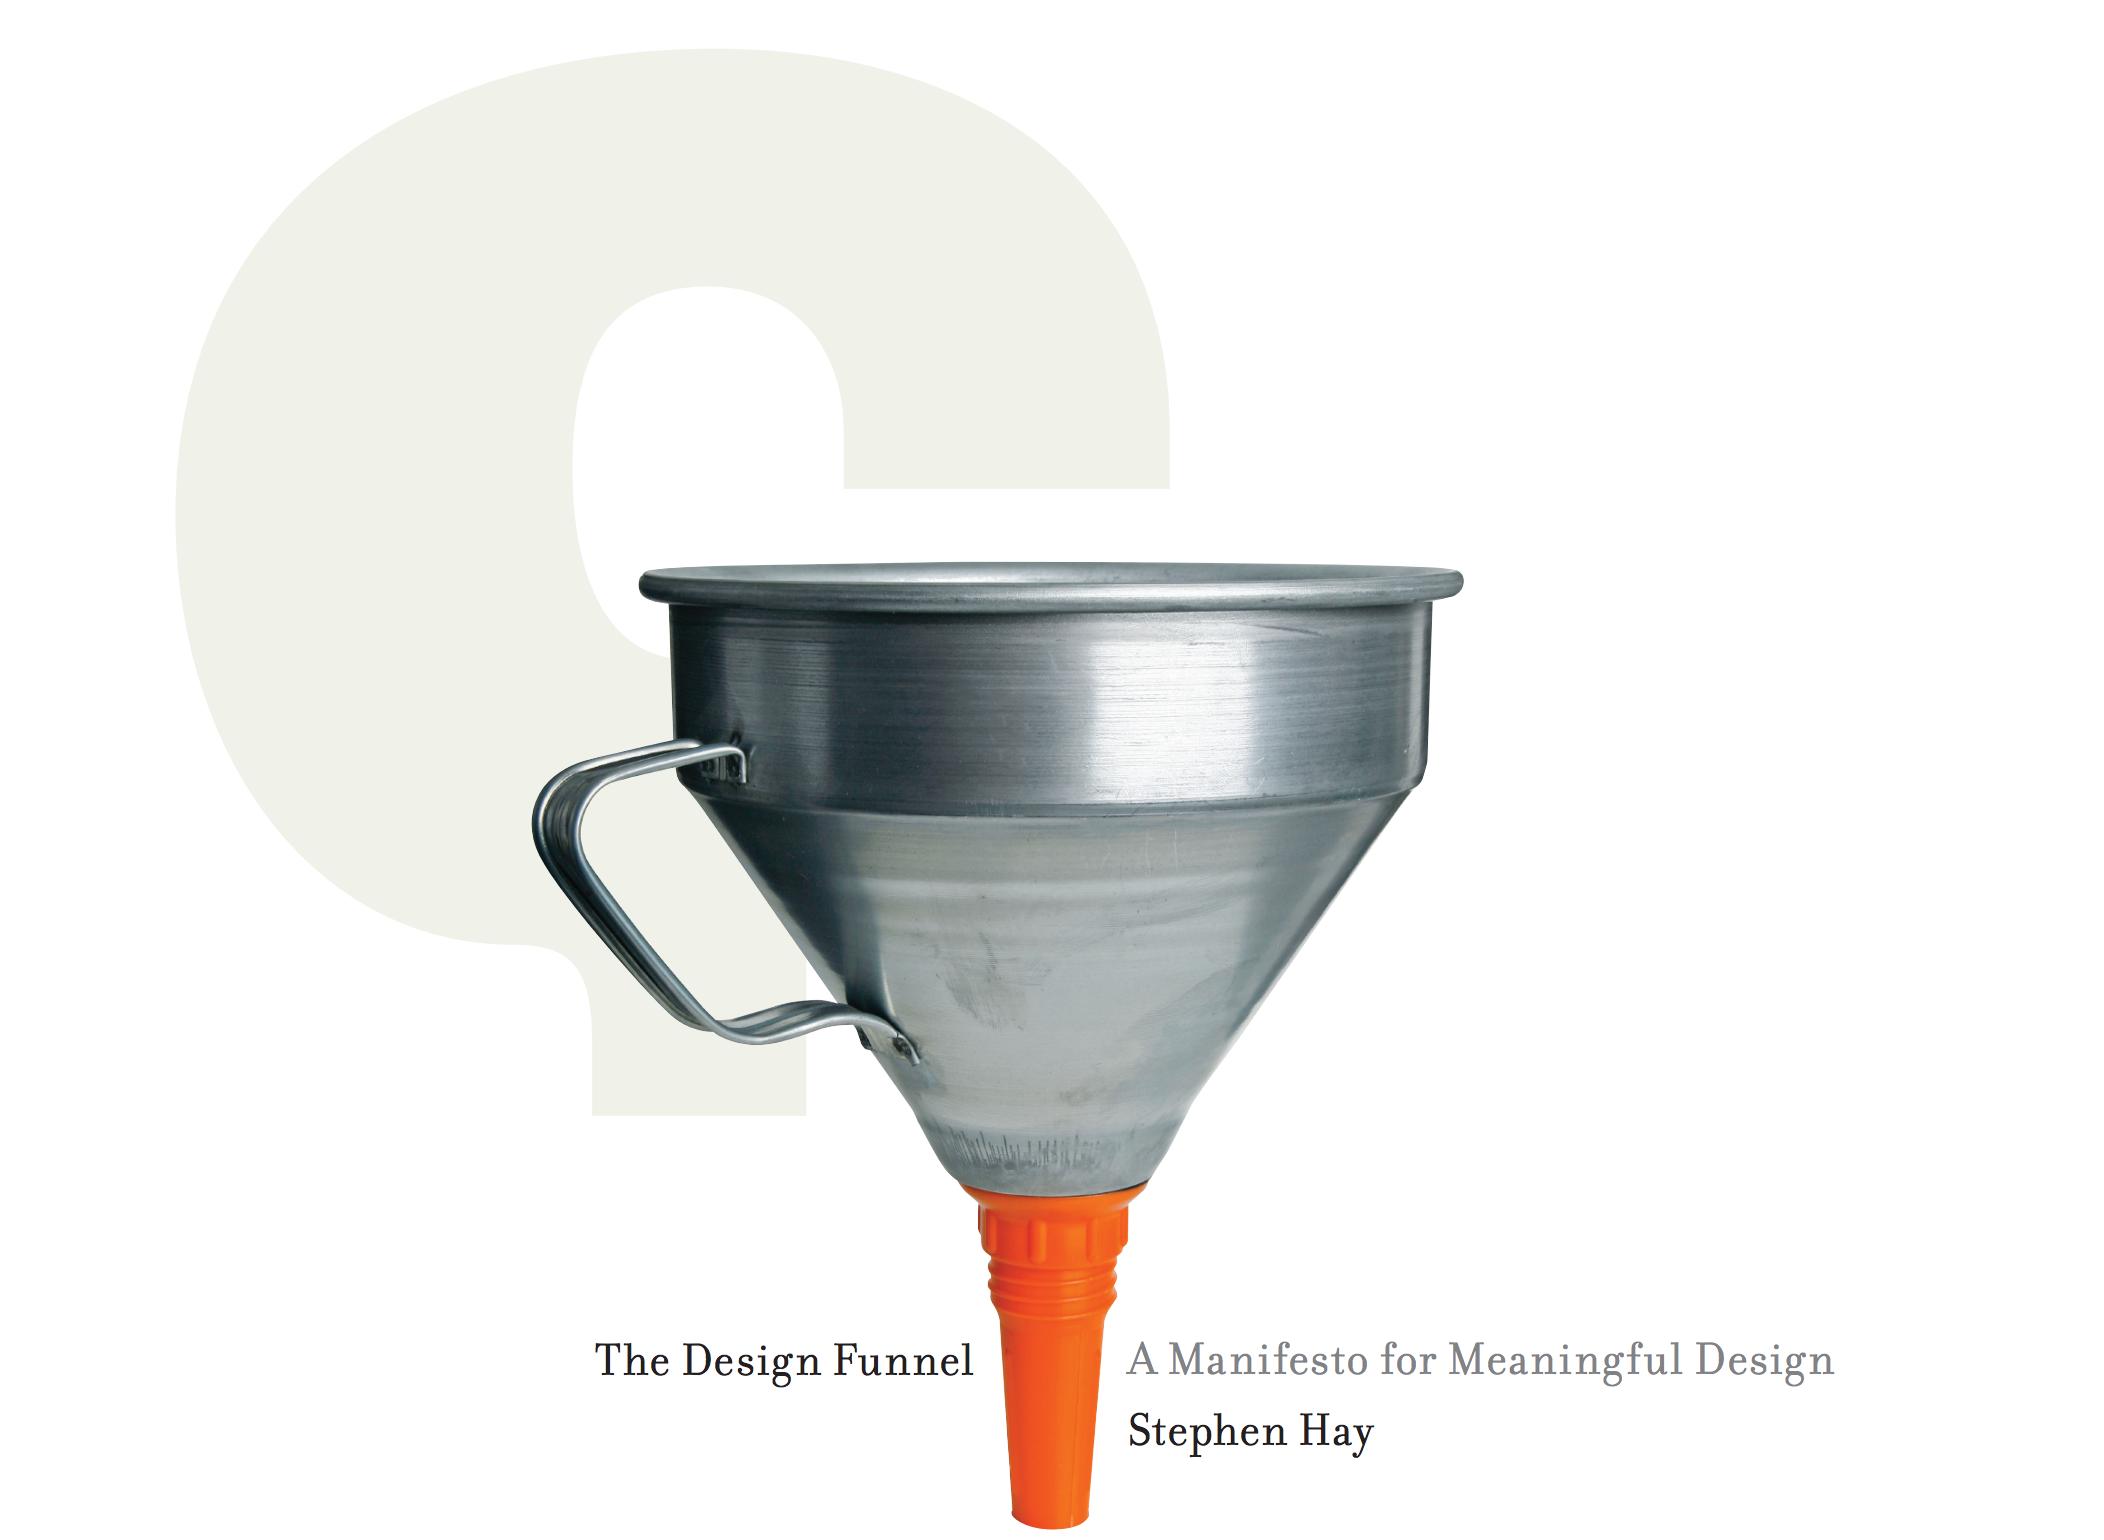 The Design Funnel — Stephen Hay